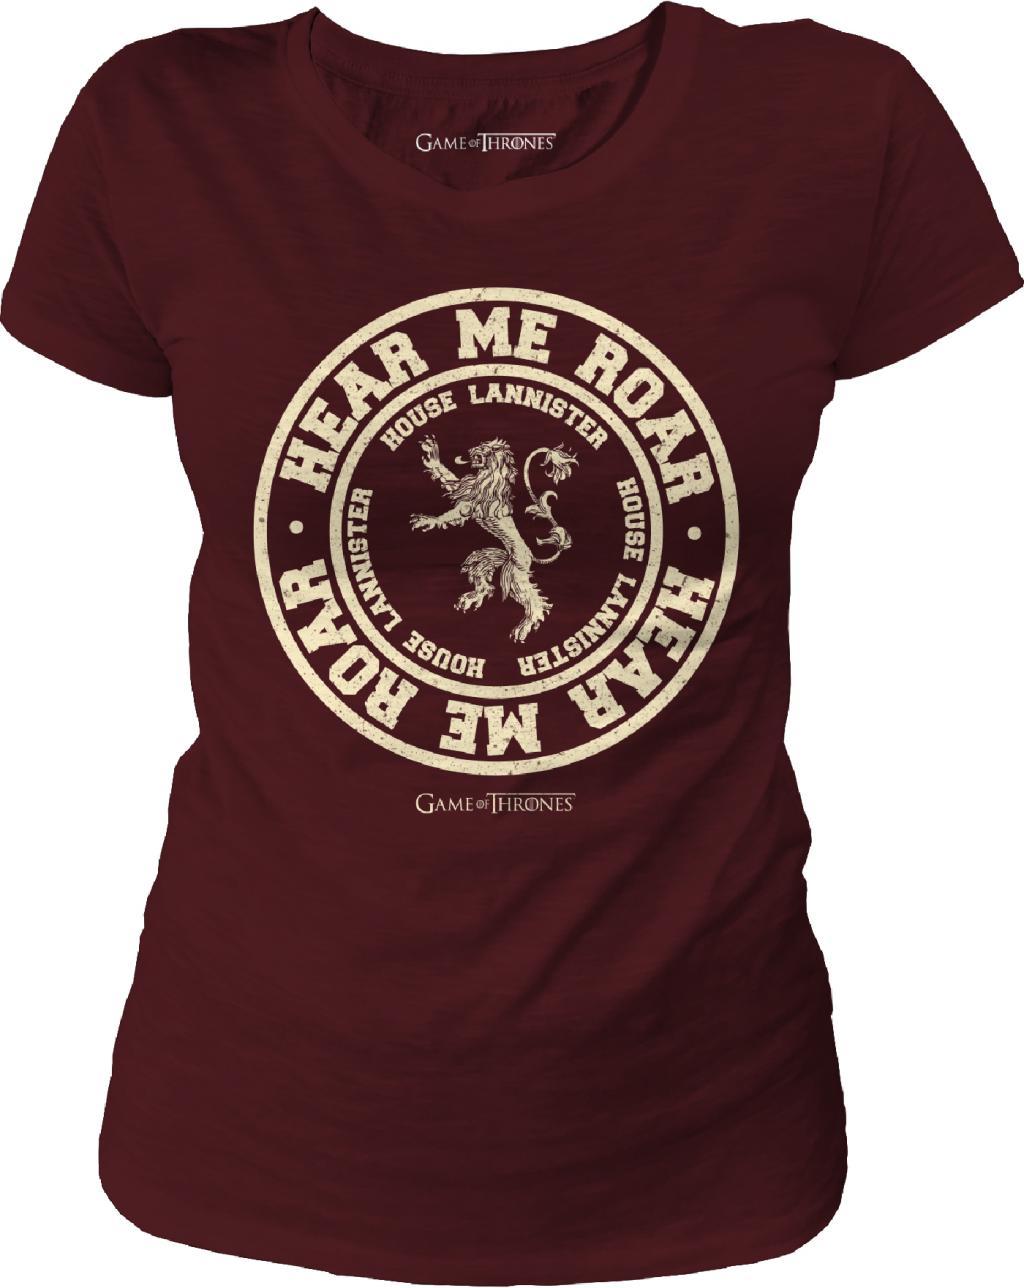 GAME OF THRONES - T-Shirt Hear me Roar - GIRL (M)